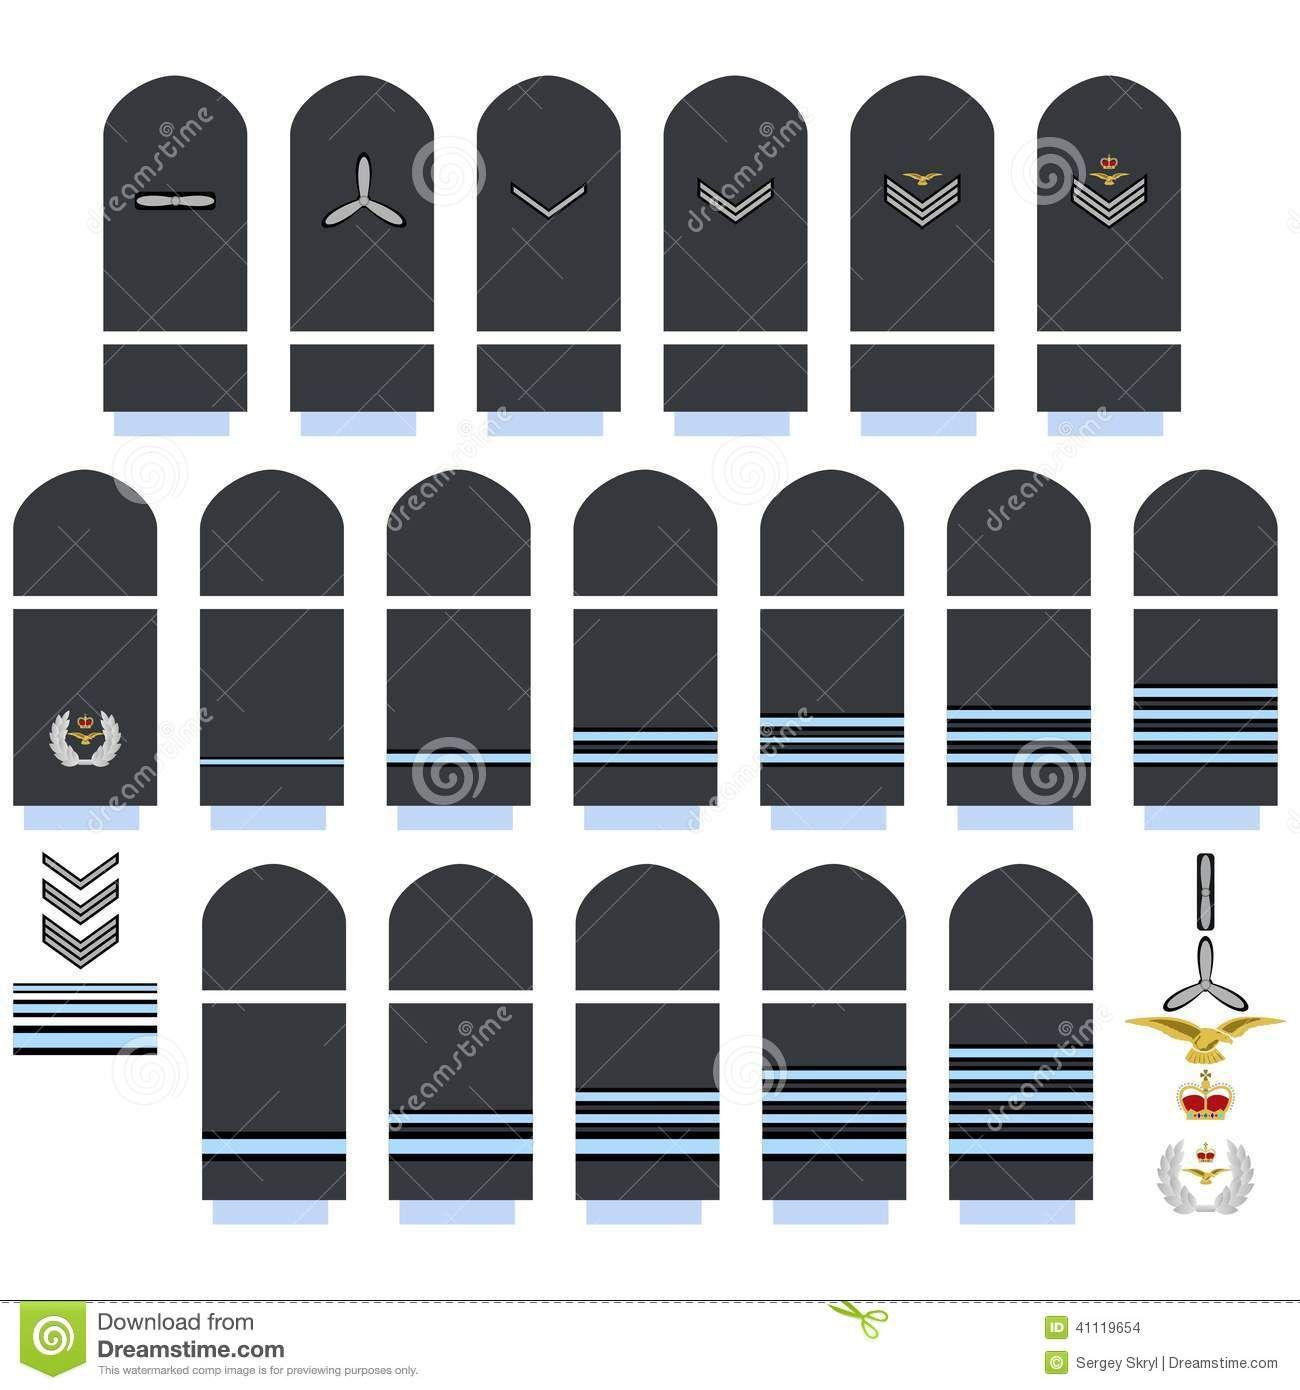 Us wwii uniform recherche google military ranks pinterest military ranks us wwii uniform recherche google biocorpaavc Images